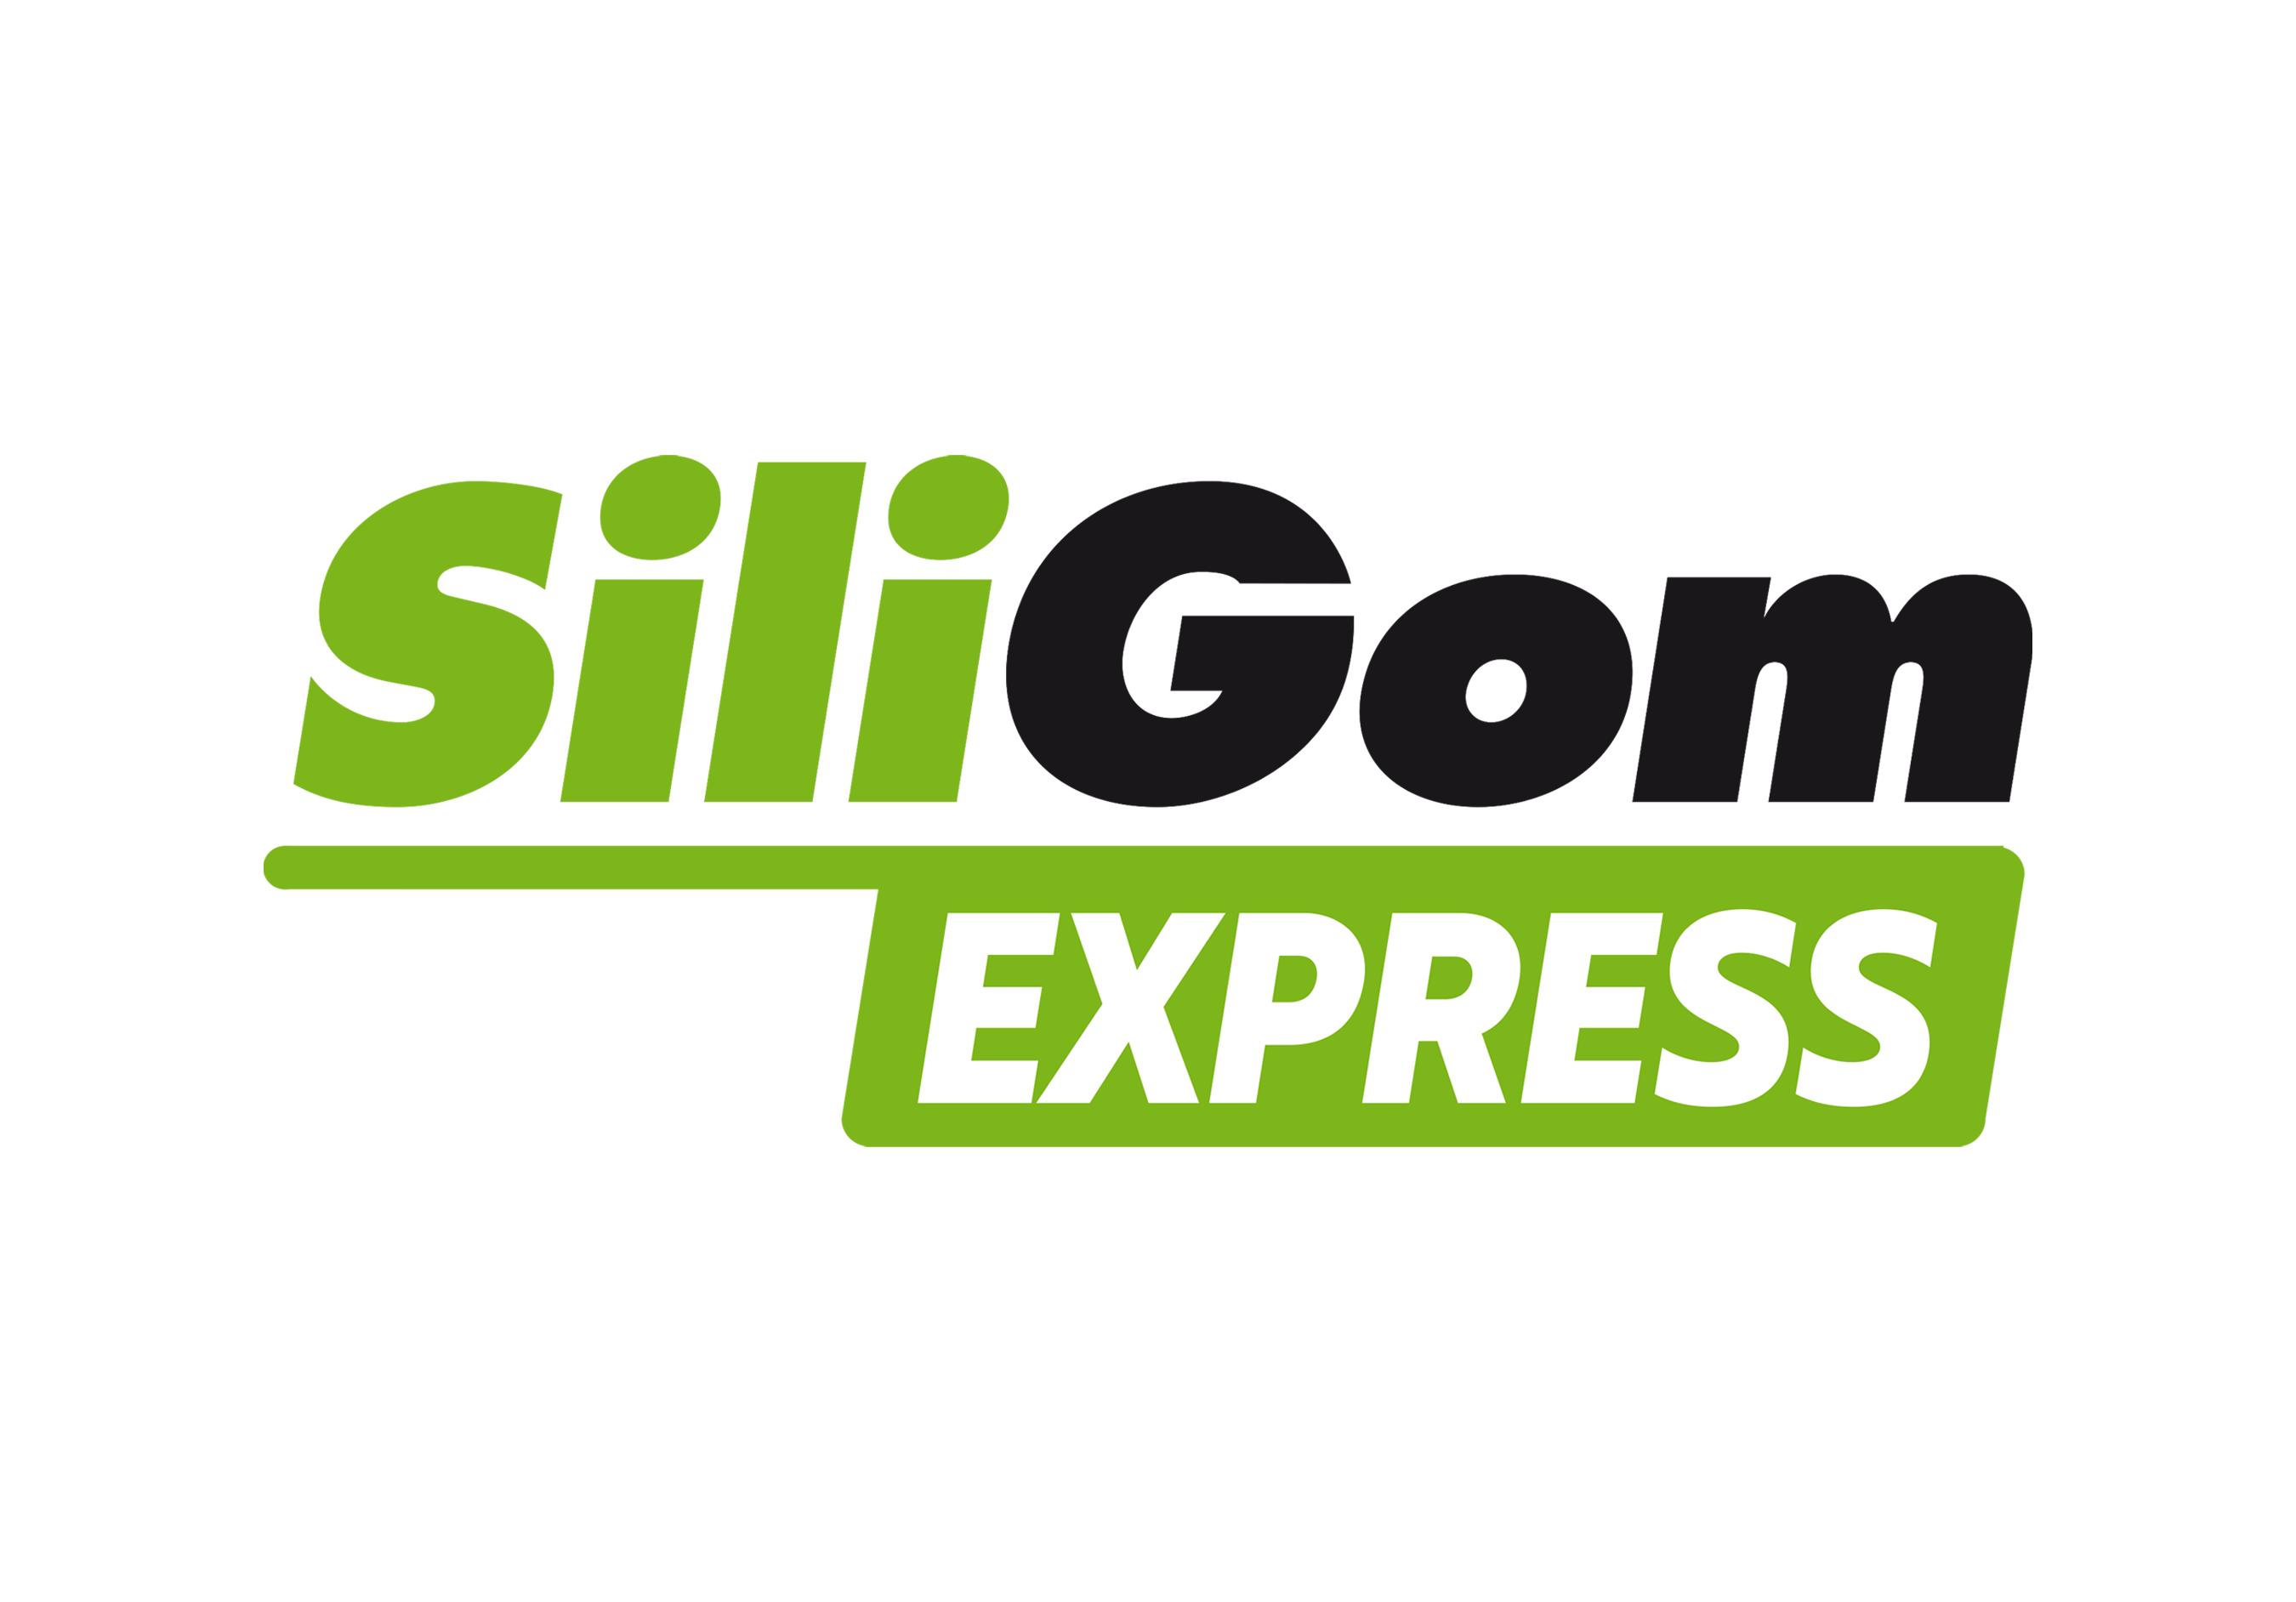 SILIGOM EXPRESS - KENNEDY SERVICES garage d'automobile, réparation